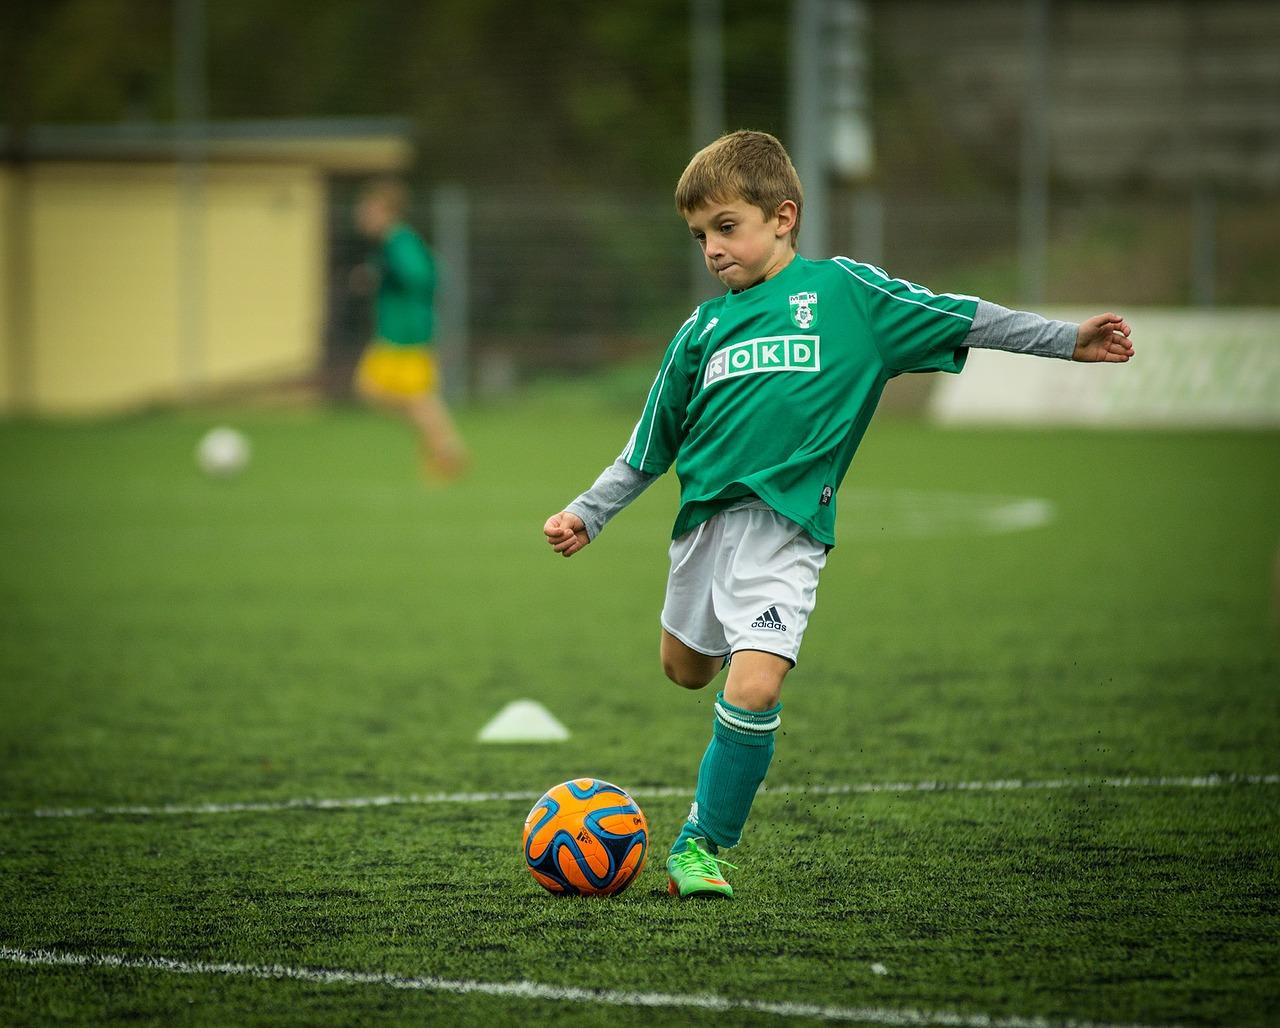 football_child